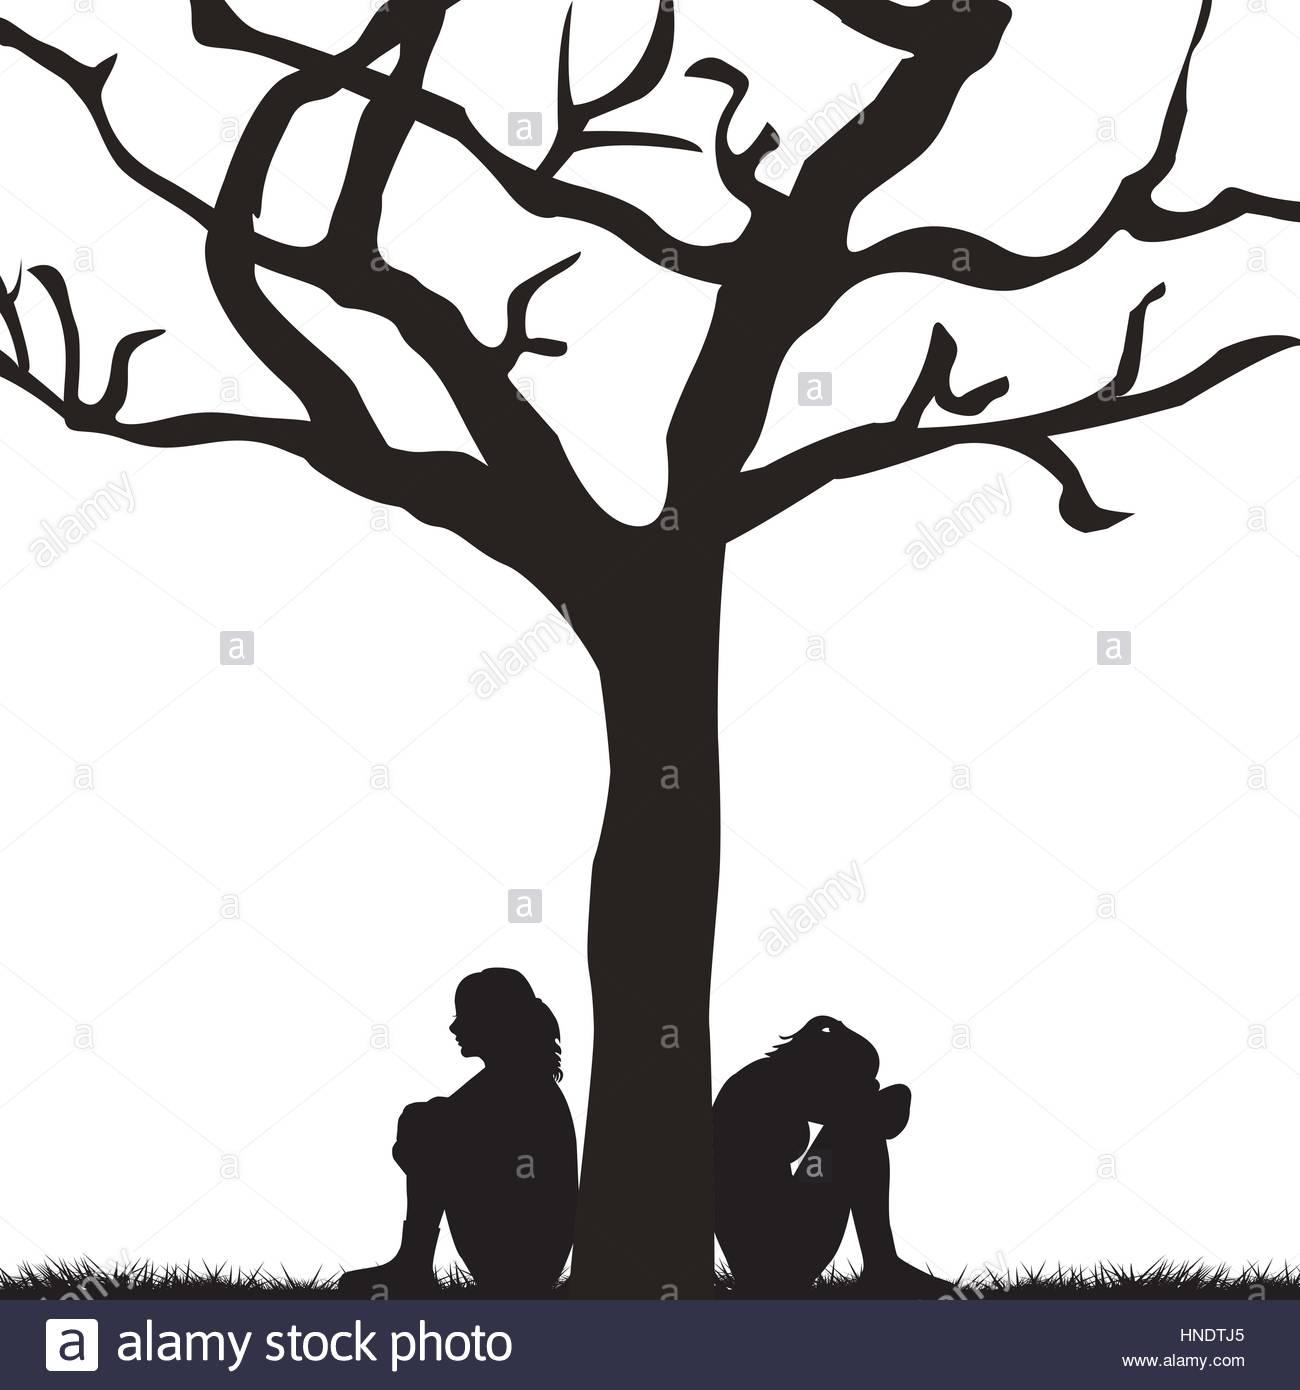 Woman Reading Book Under Tree Stock Image - Image of enjoy